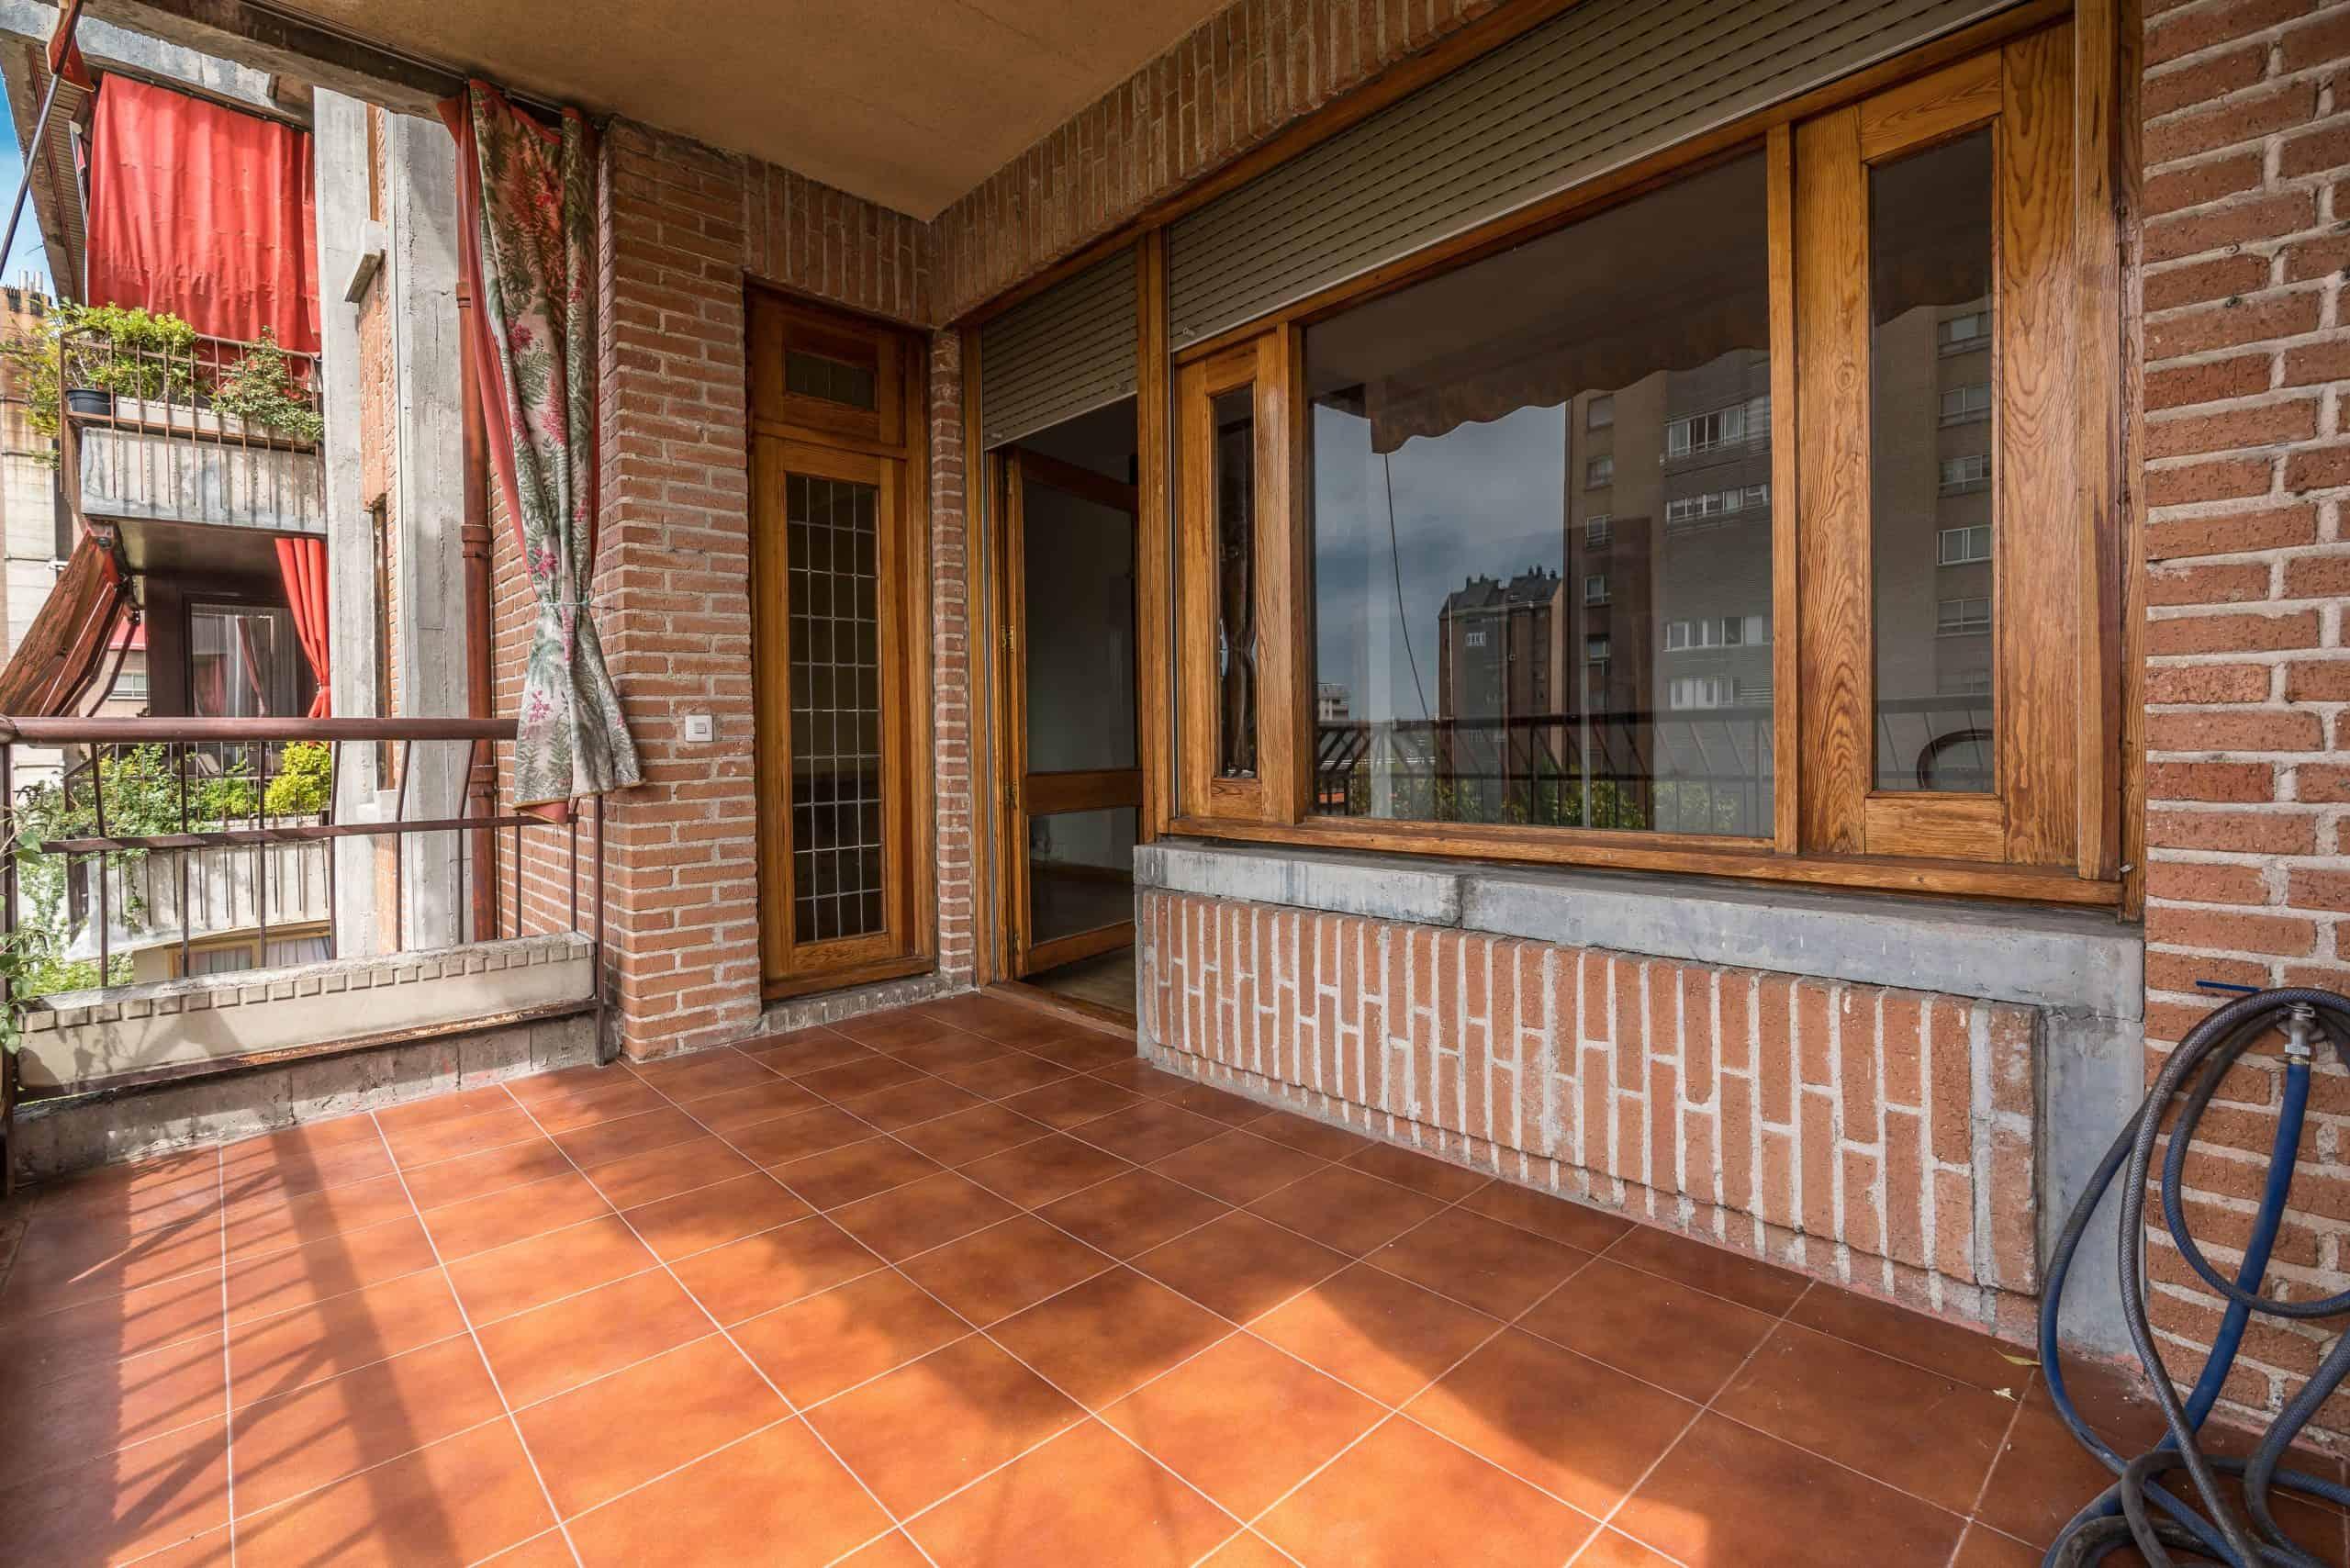 Agencia Inmobiliaria de Madrid-FUTUROCASA-Zona ARGANZUELA-EMBAJADORES-LEGAZPI -calle Embajadores- baño 13